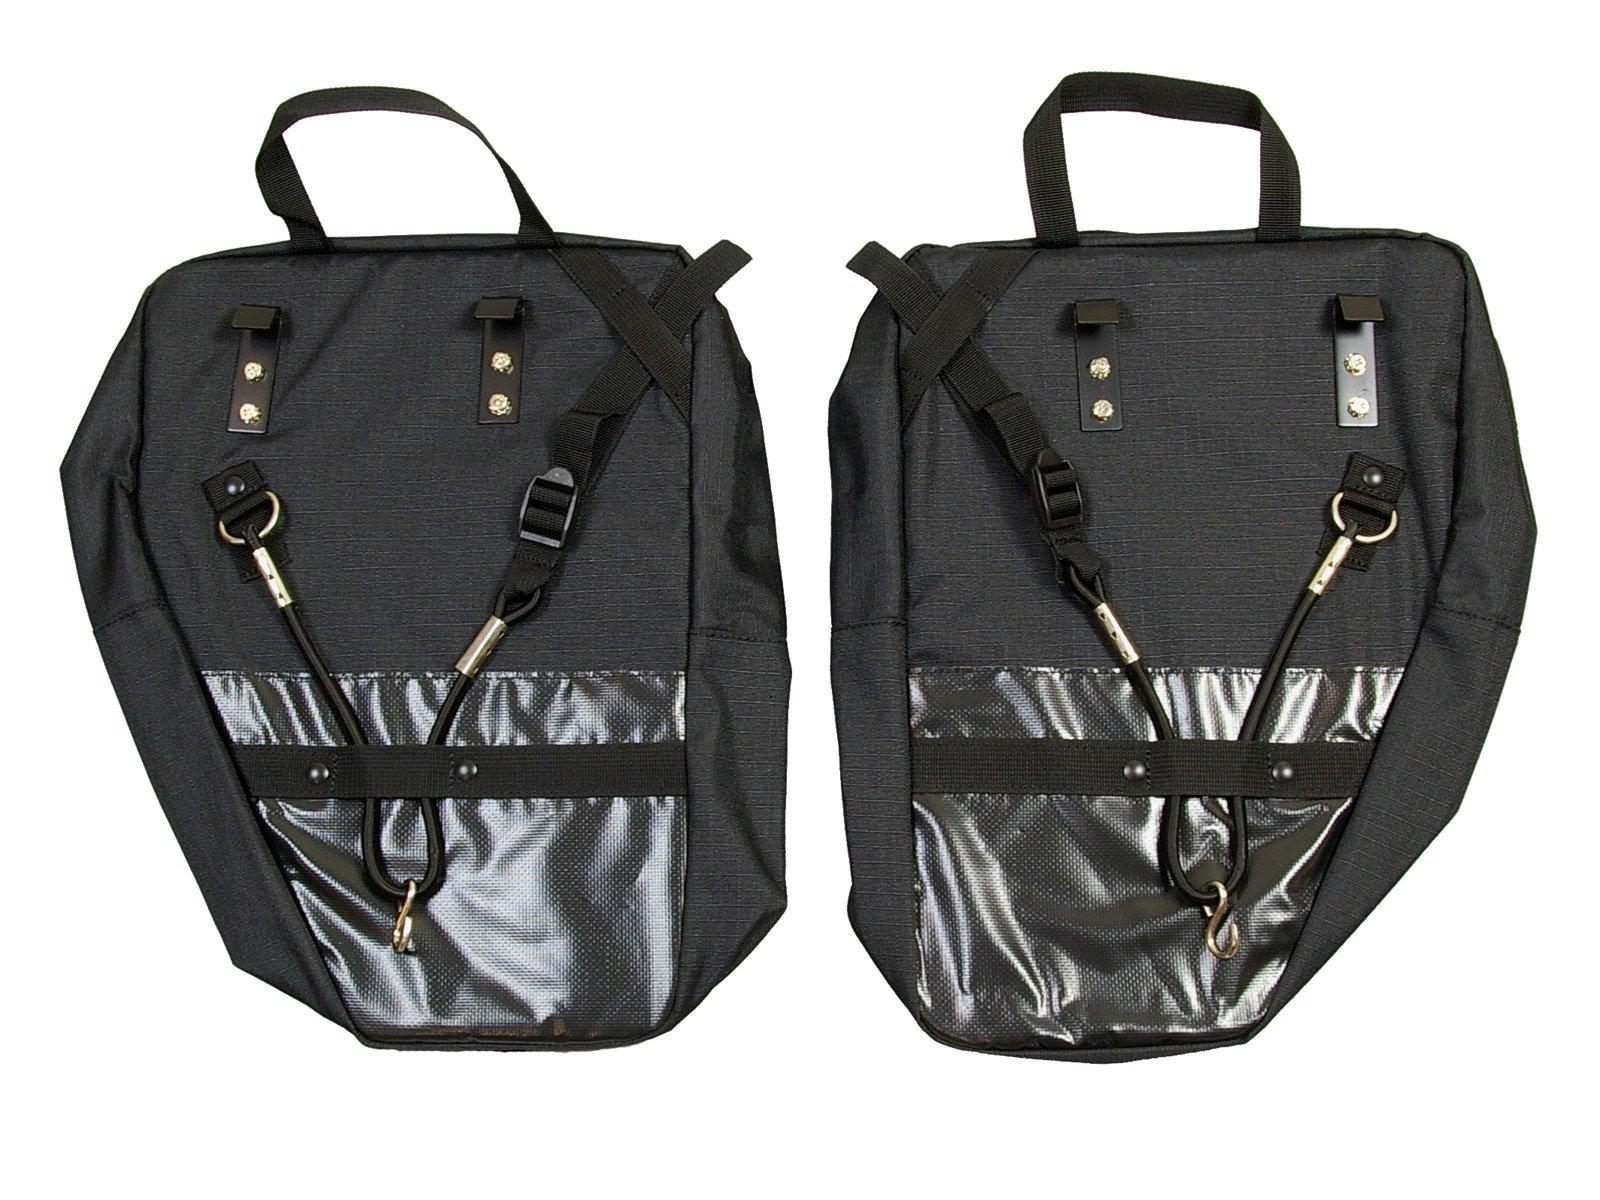 Bushwhacker® Moab Black - Bicycle Rear / Front Pannier Cycling Rack Pack Bike Bag - w/ Reflective Trim - Sold as Pair by Bushwhacker (Image #2)